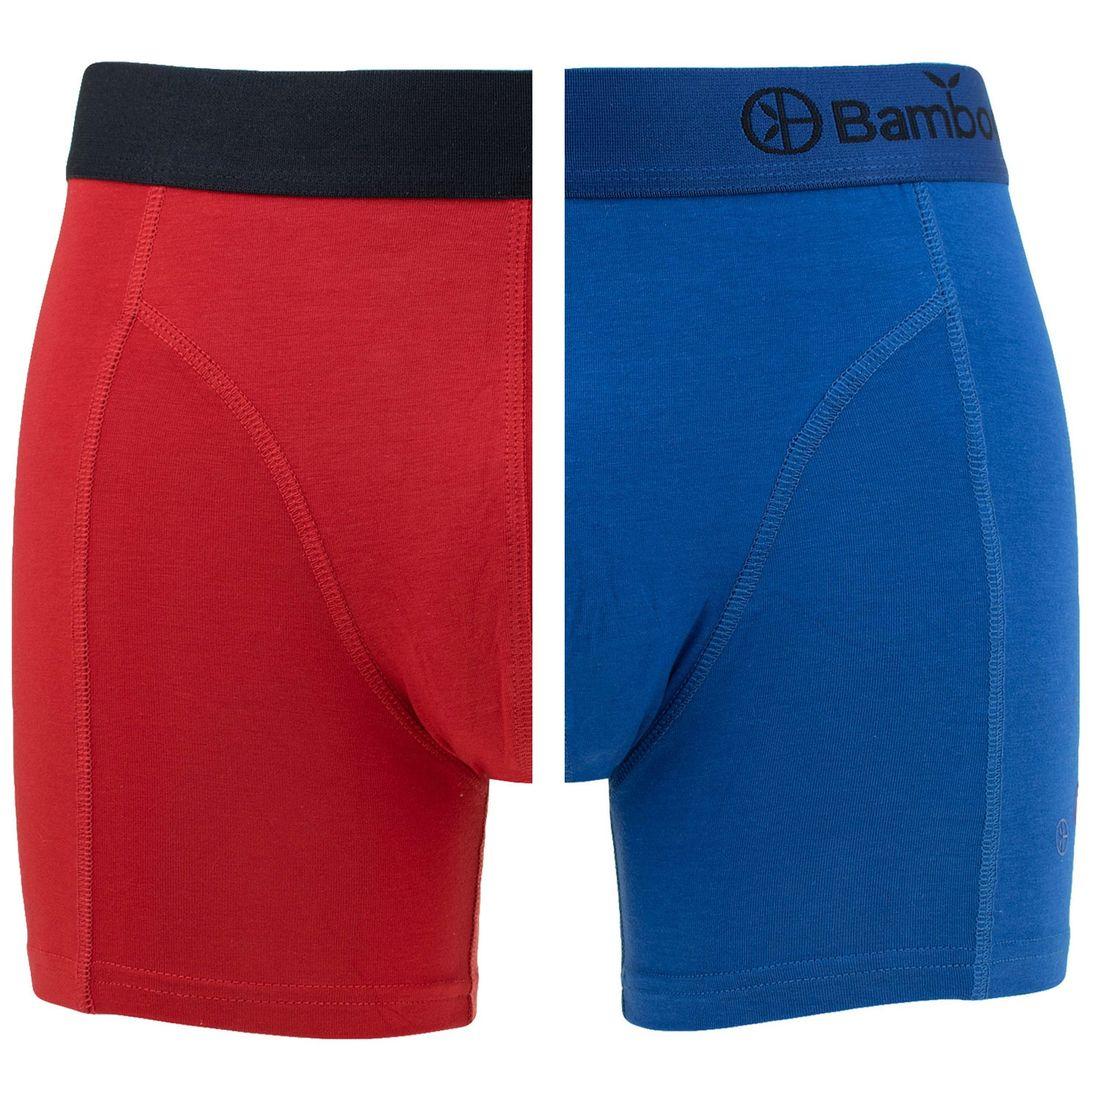 Afbeelding van Bamboo Basics boxers levi 2 pack rood & blauw heren